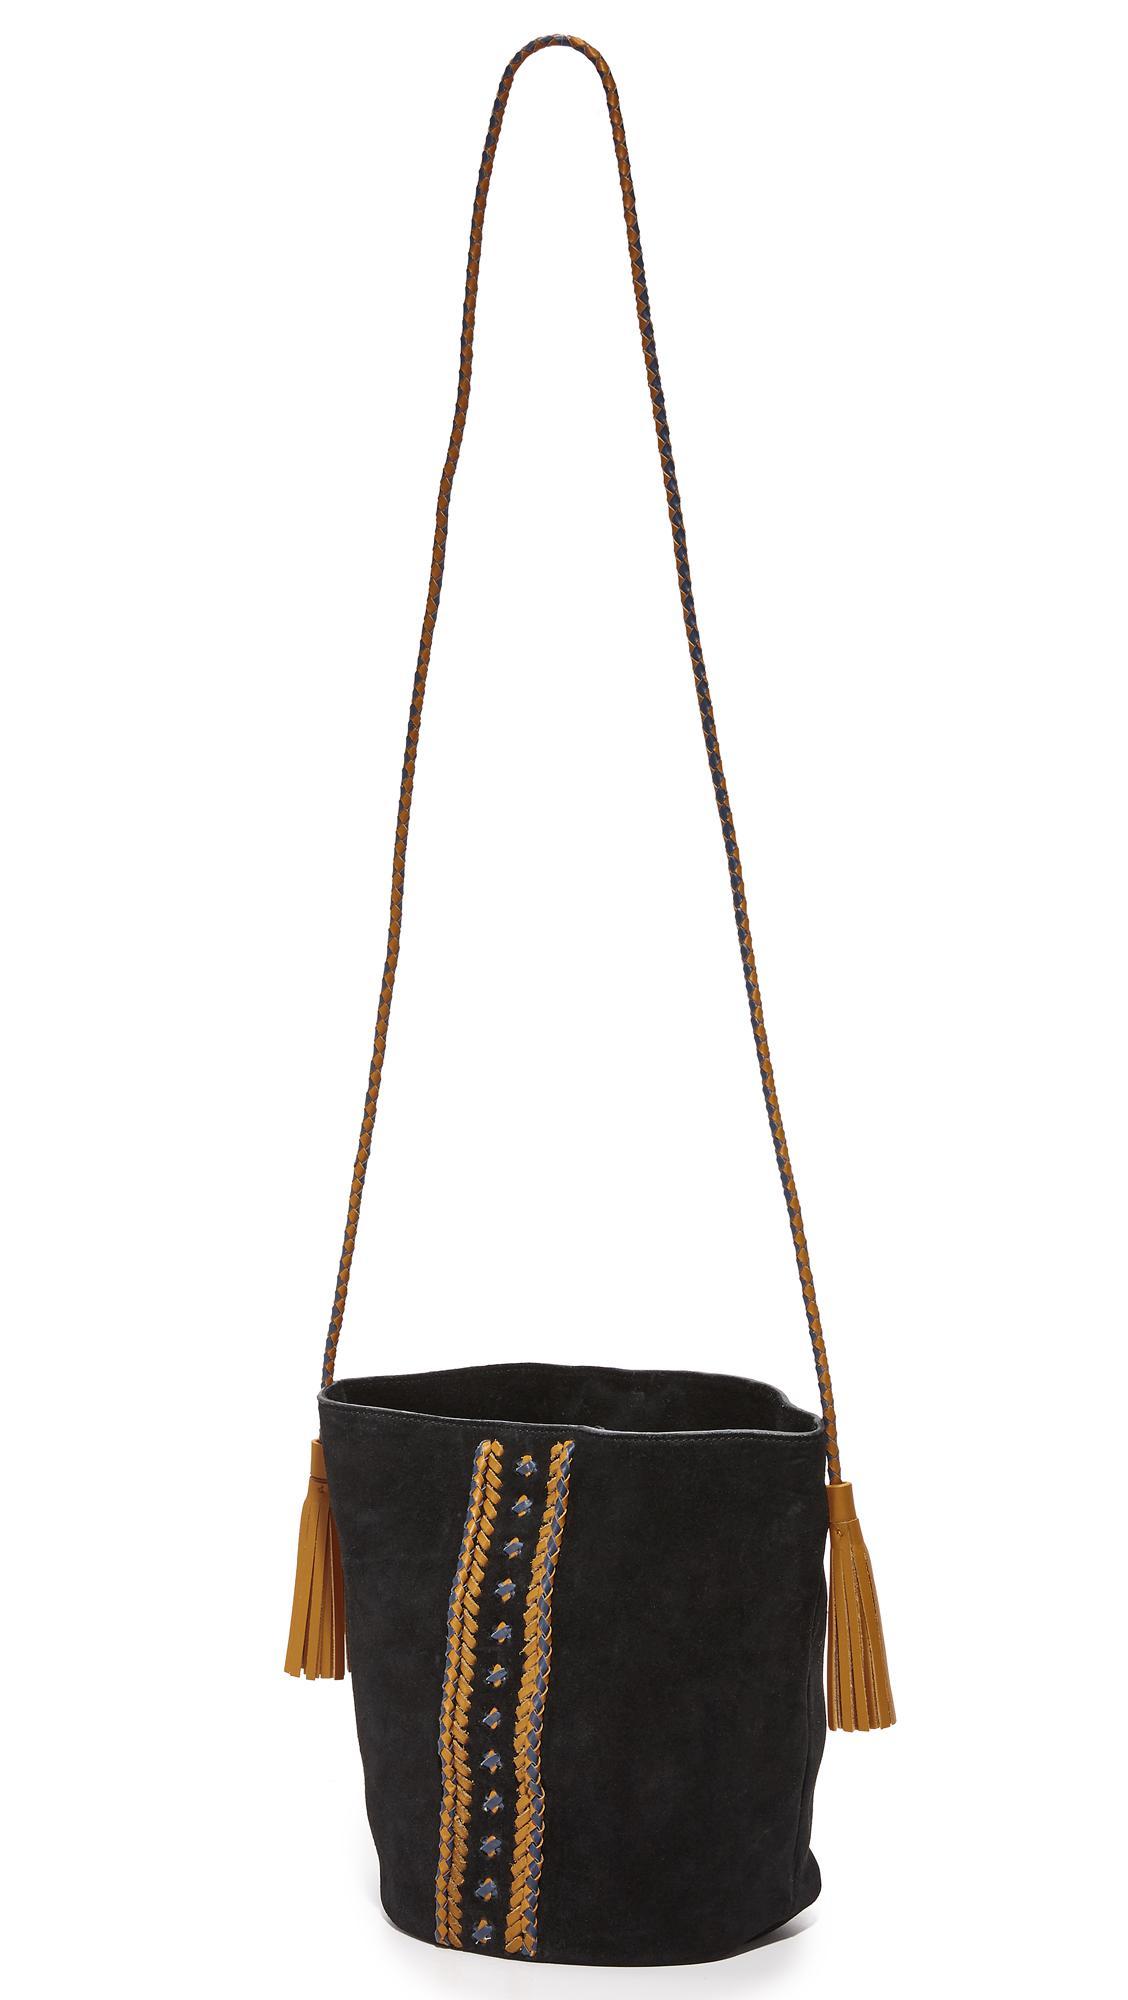 df517f936f Antik Batik Dori Bag in Black - Lyst